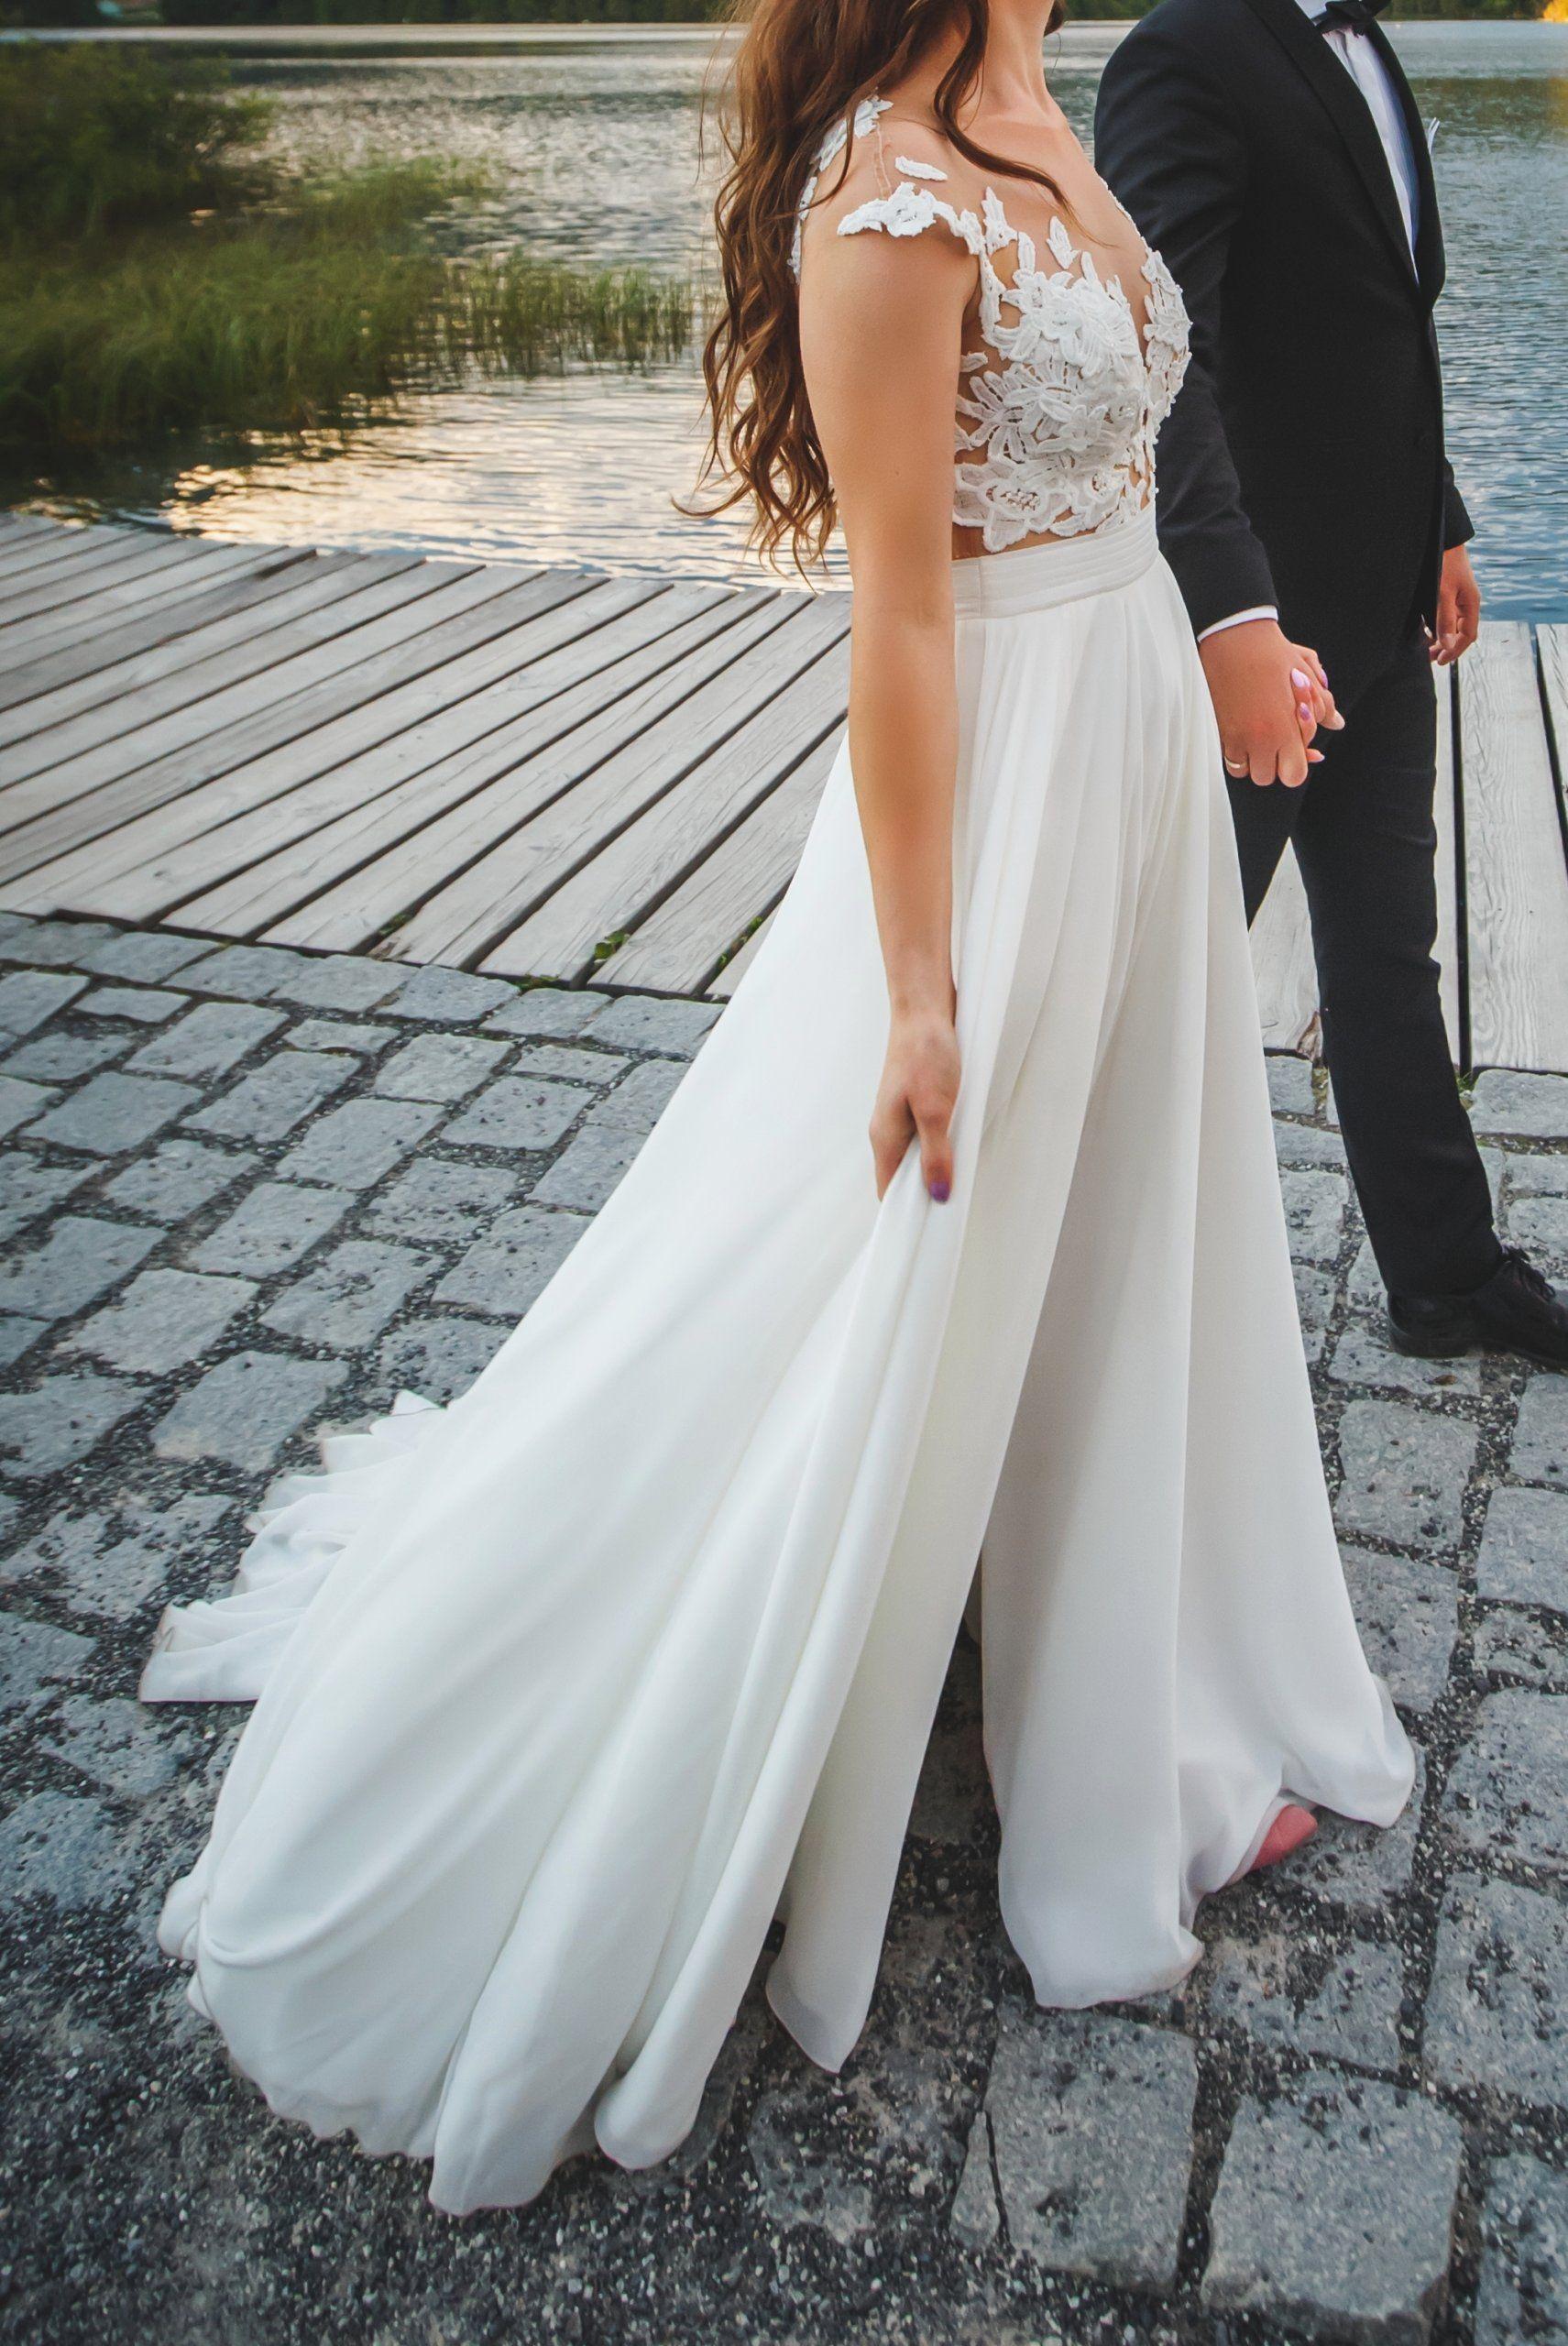 Suknia Slubna Milla Nova 36 170cm Wzrostu 9cm 6950665187 Oficjalne Archiwum Allegro Sleeveless Wedding Formal Dresses Wedding Dresses